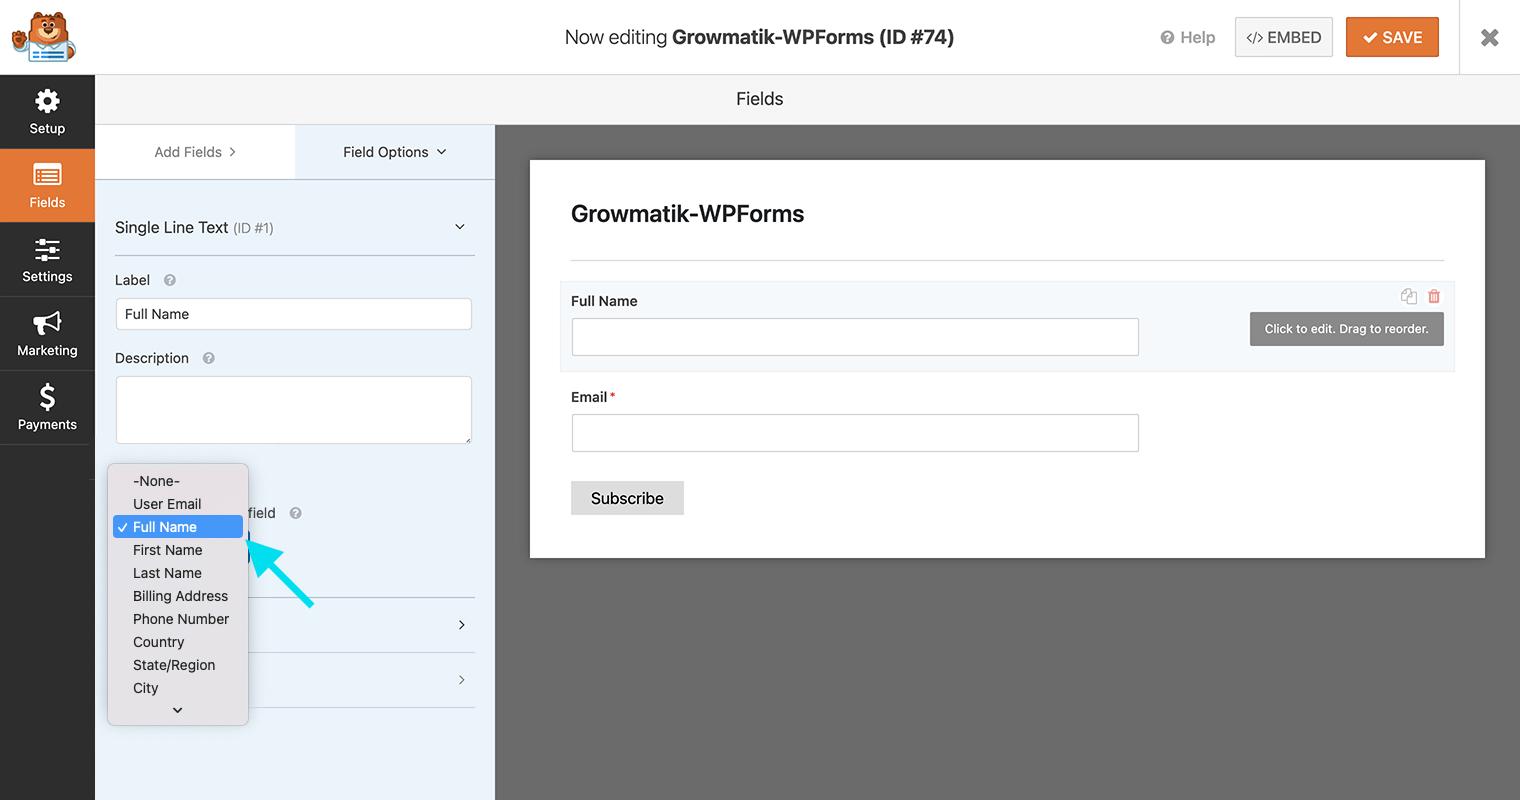 WPForms Growmatik fields